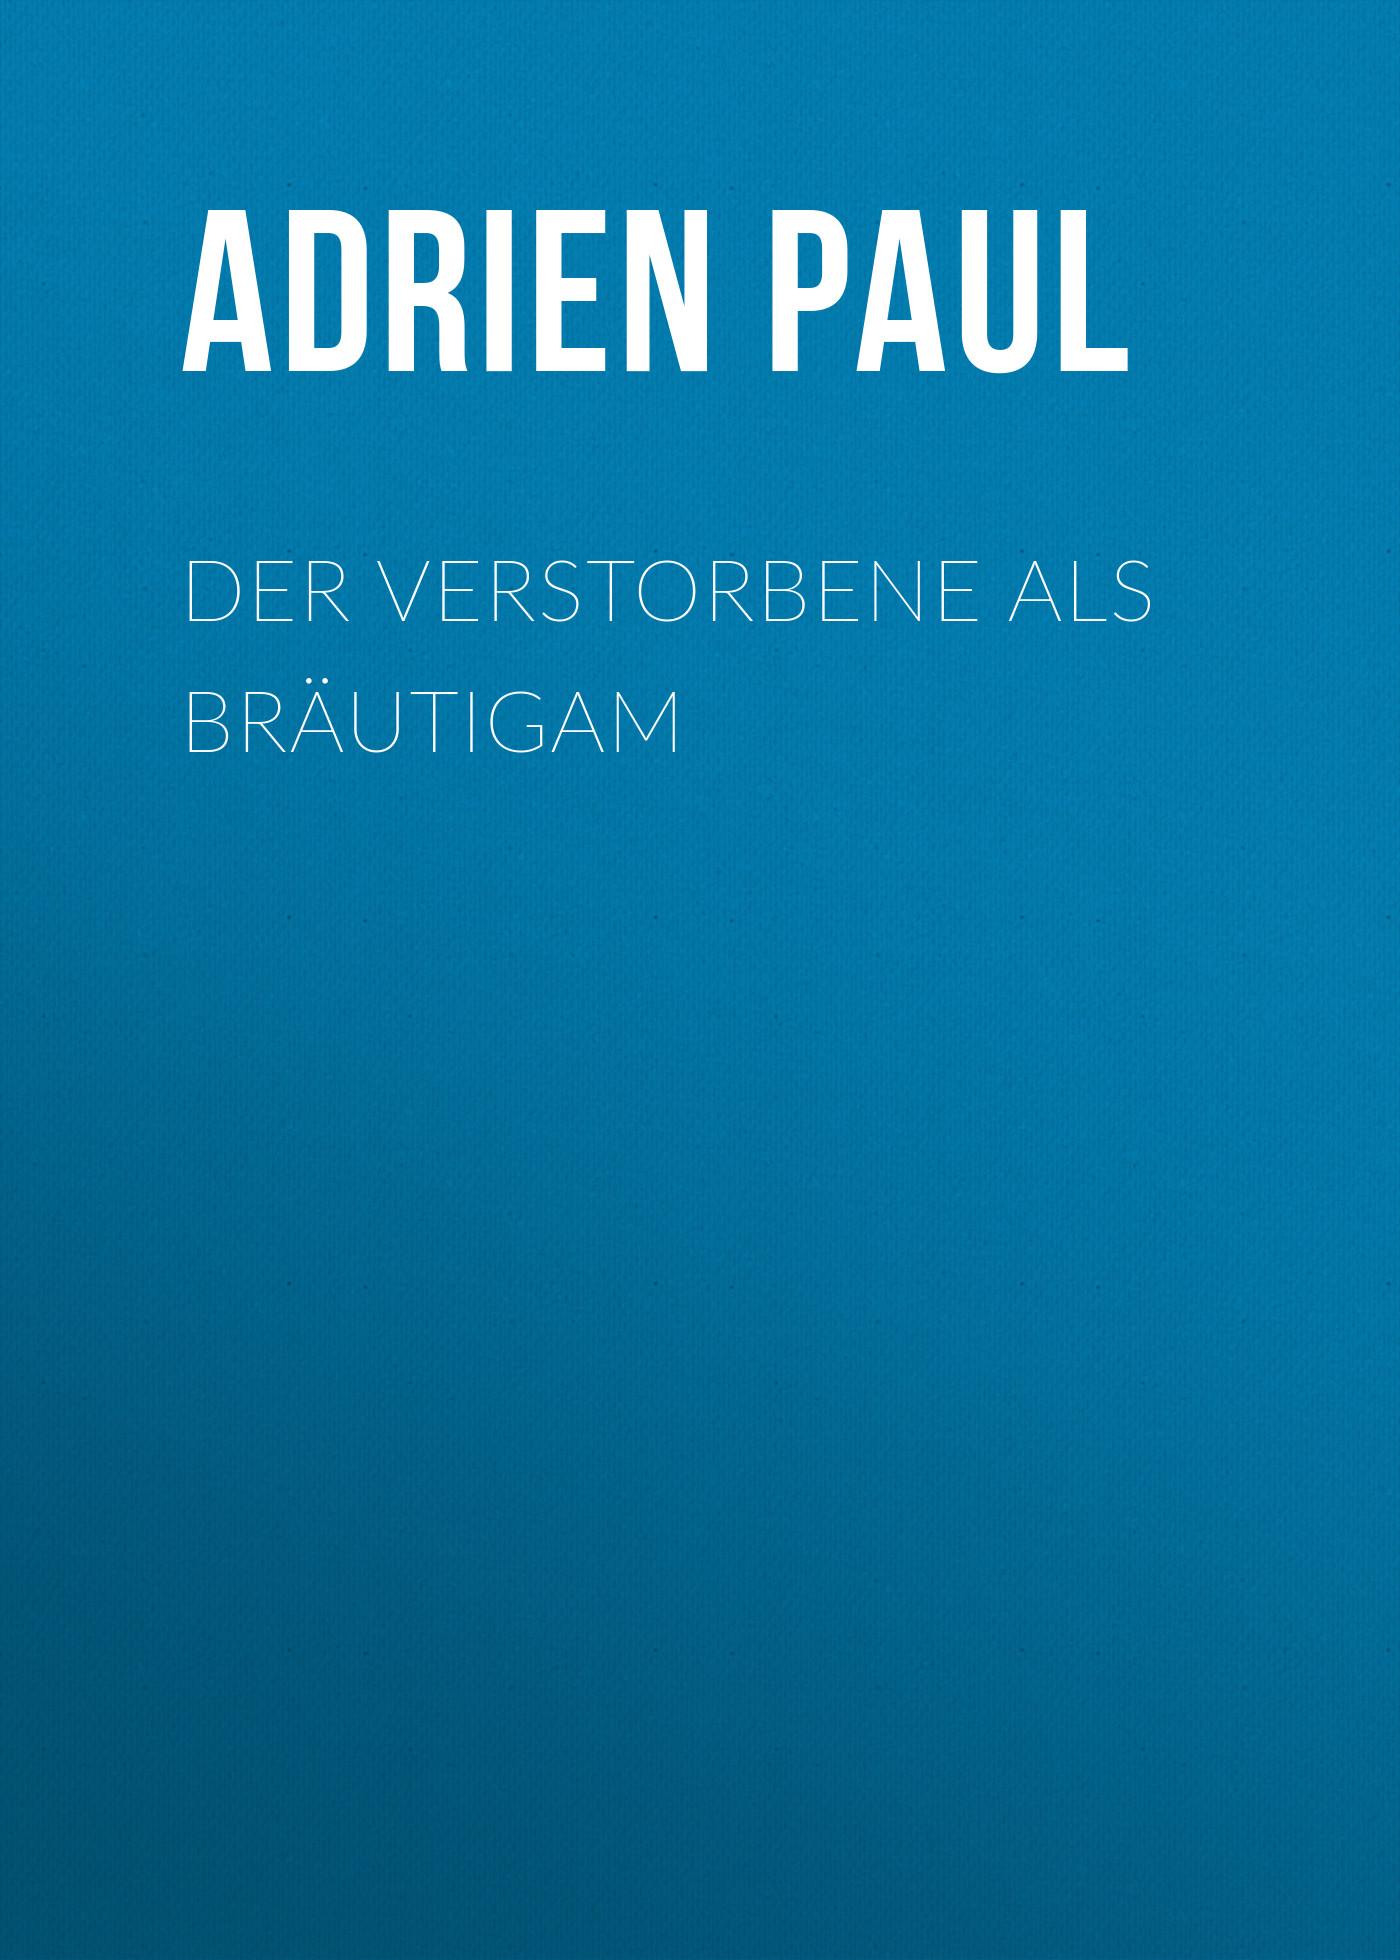 Adrien Paul Der Verstorbene als Bräutigam двухсторонний фалоимитатор adrien lastic twins